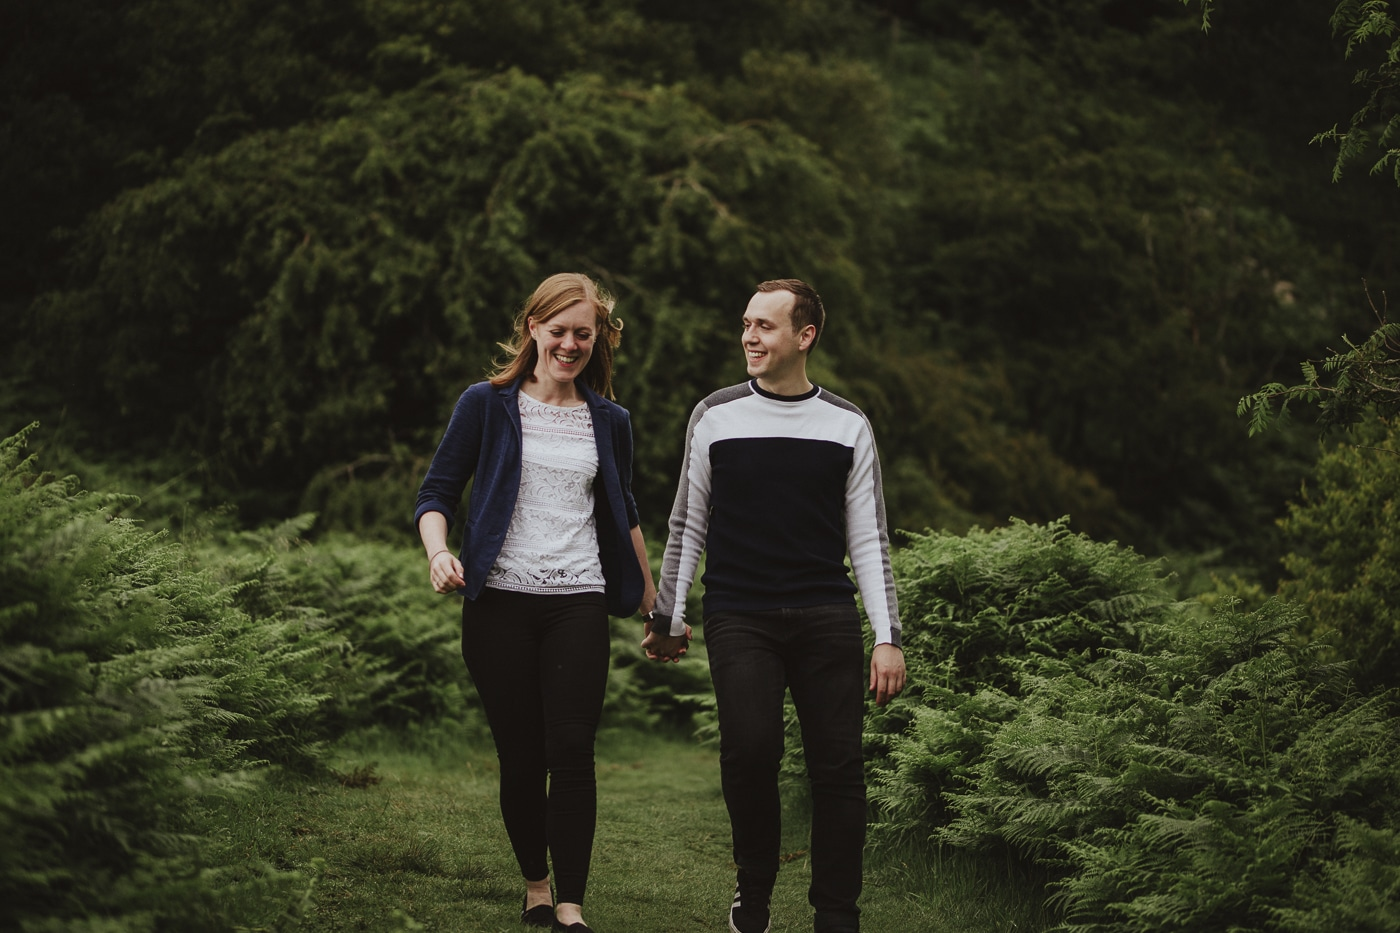 Couple walking down grassy path in Cumbria Portrait